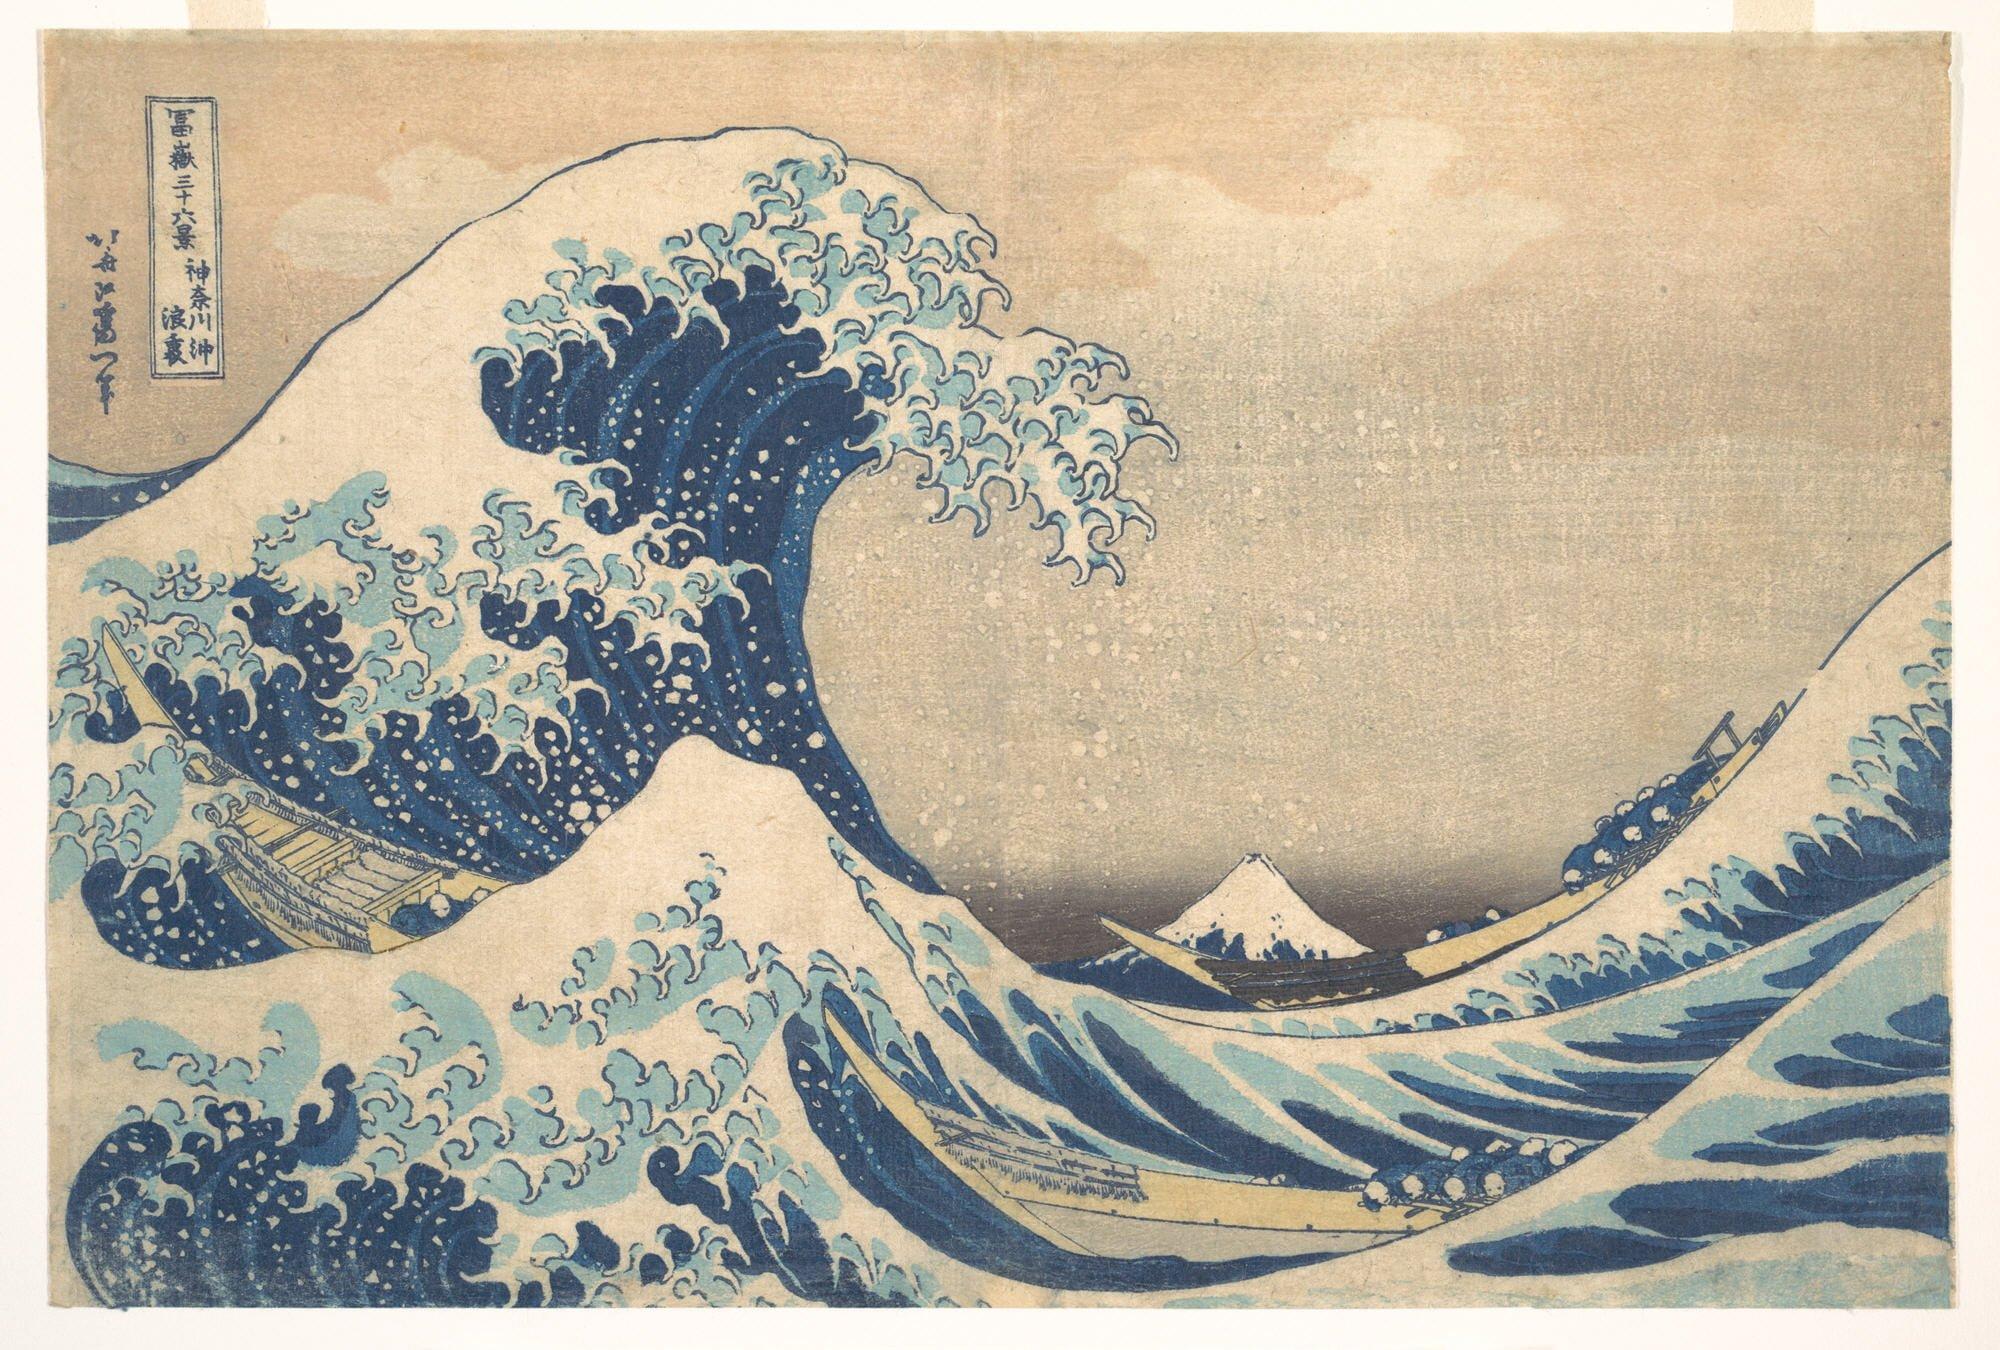 Katsushika Hokusai's Under the Wave off Kanagawa